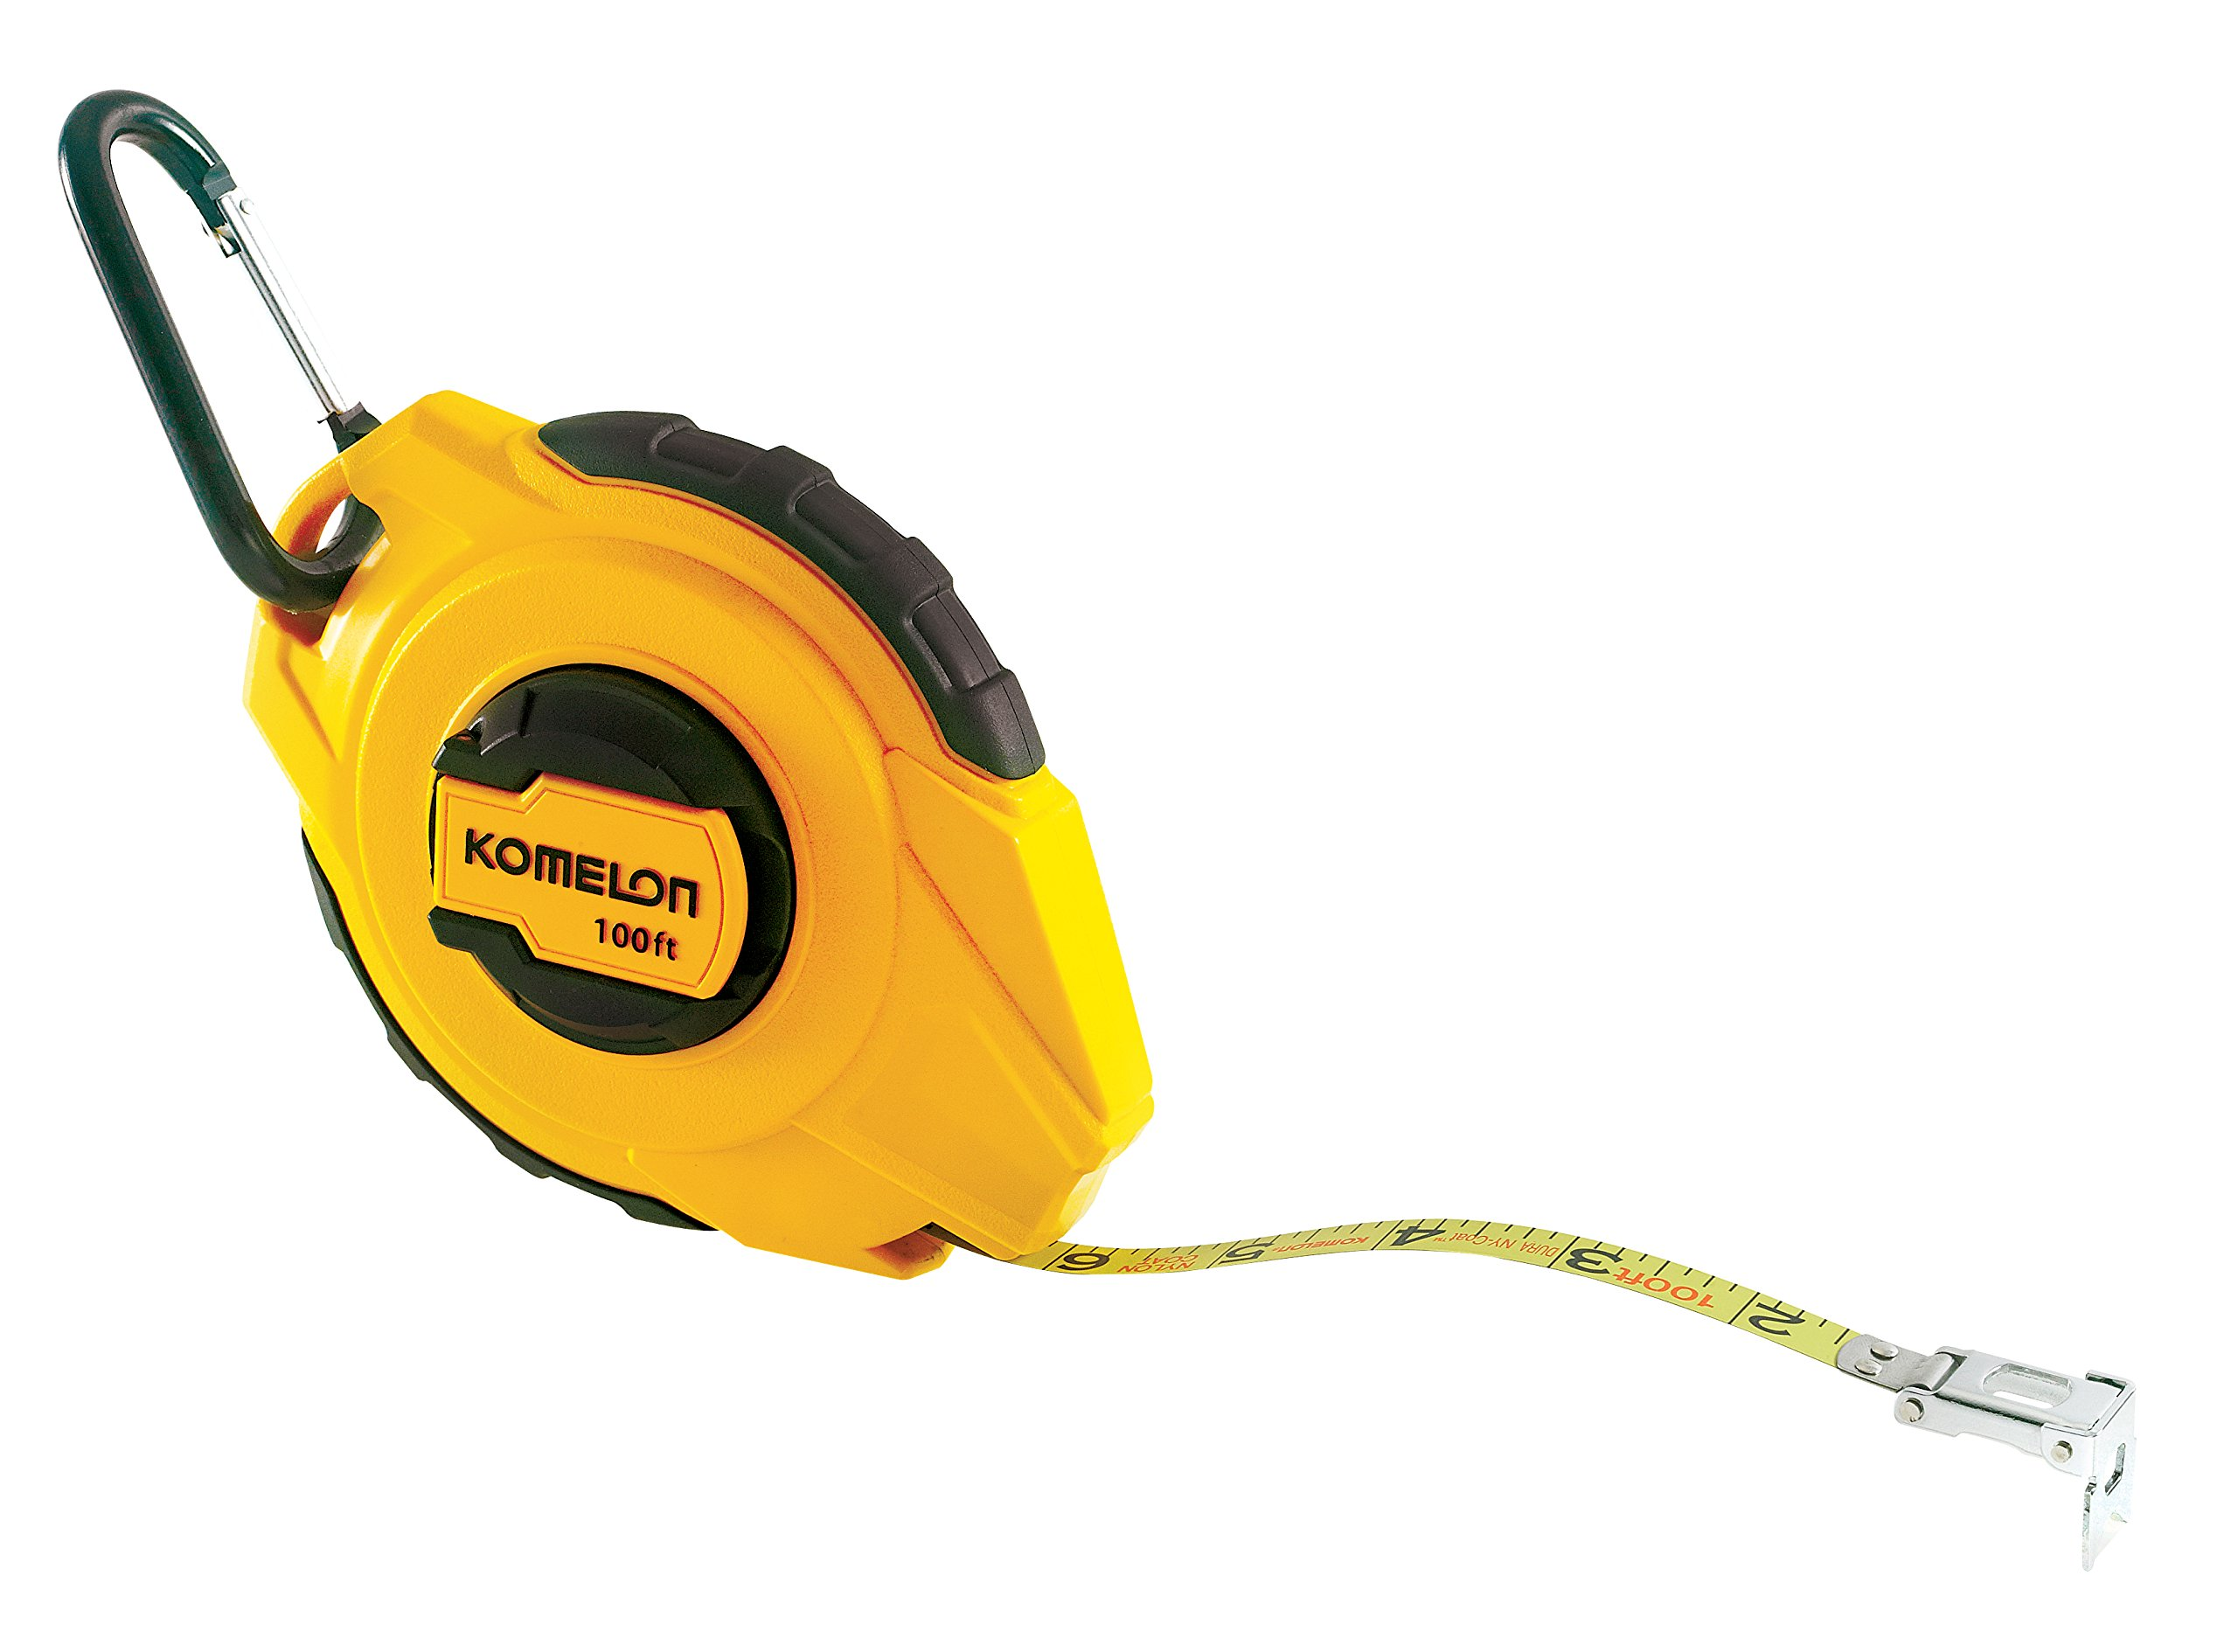 Komelon 9911 Gripper Evolution Tape Measures, Small, Yellow/Black